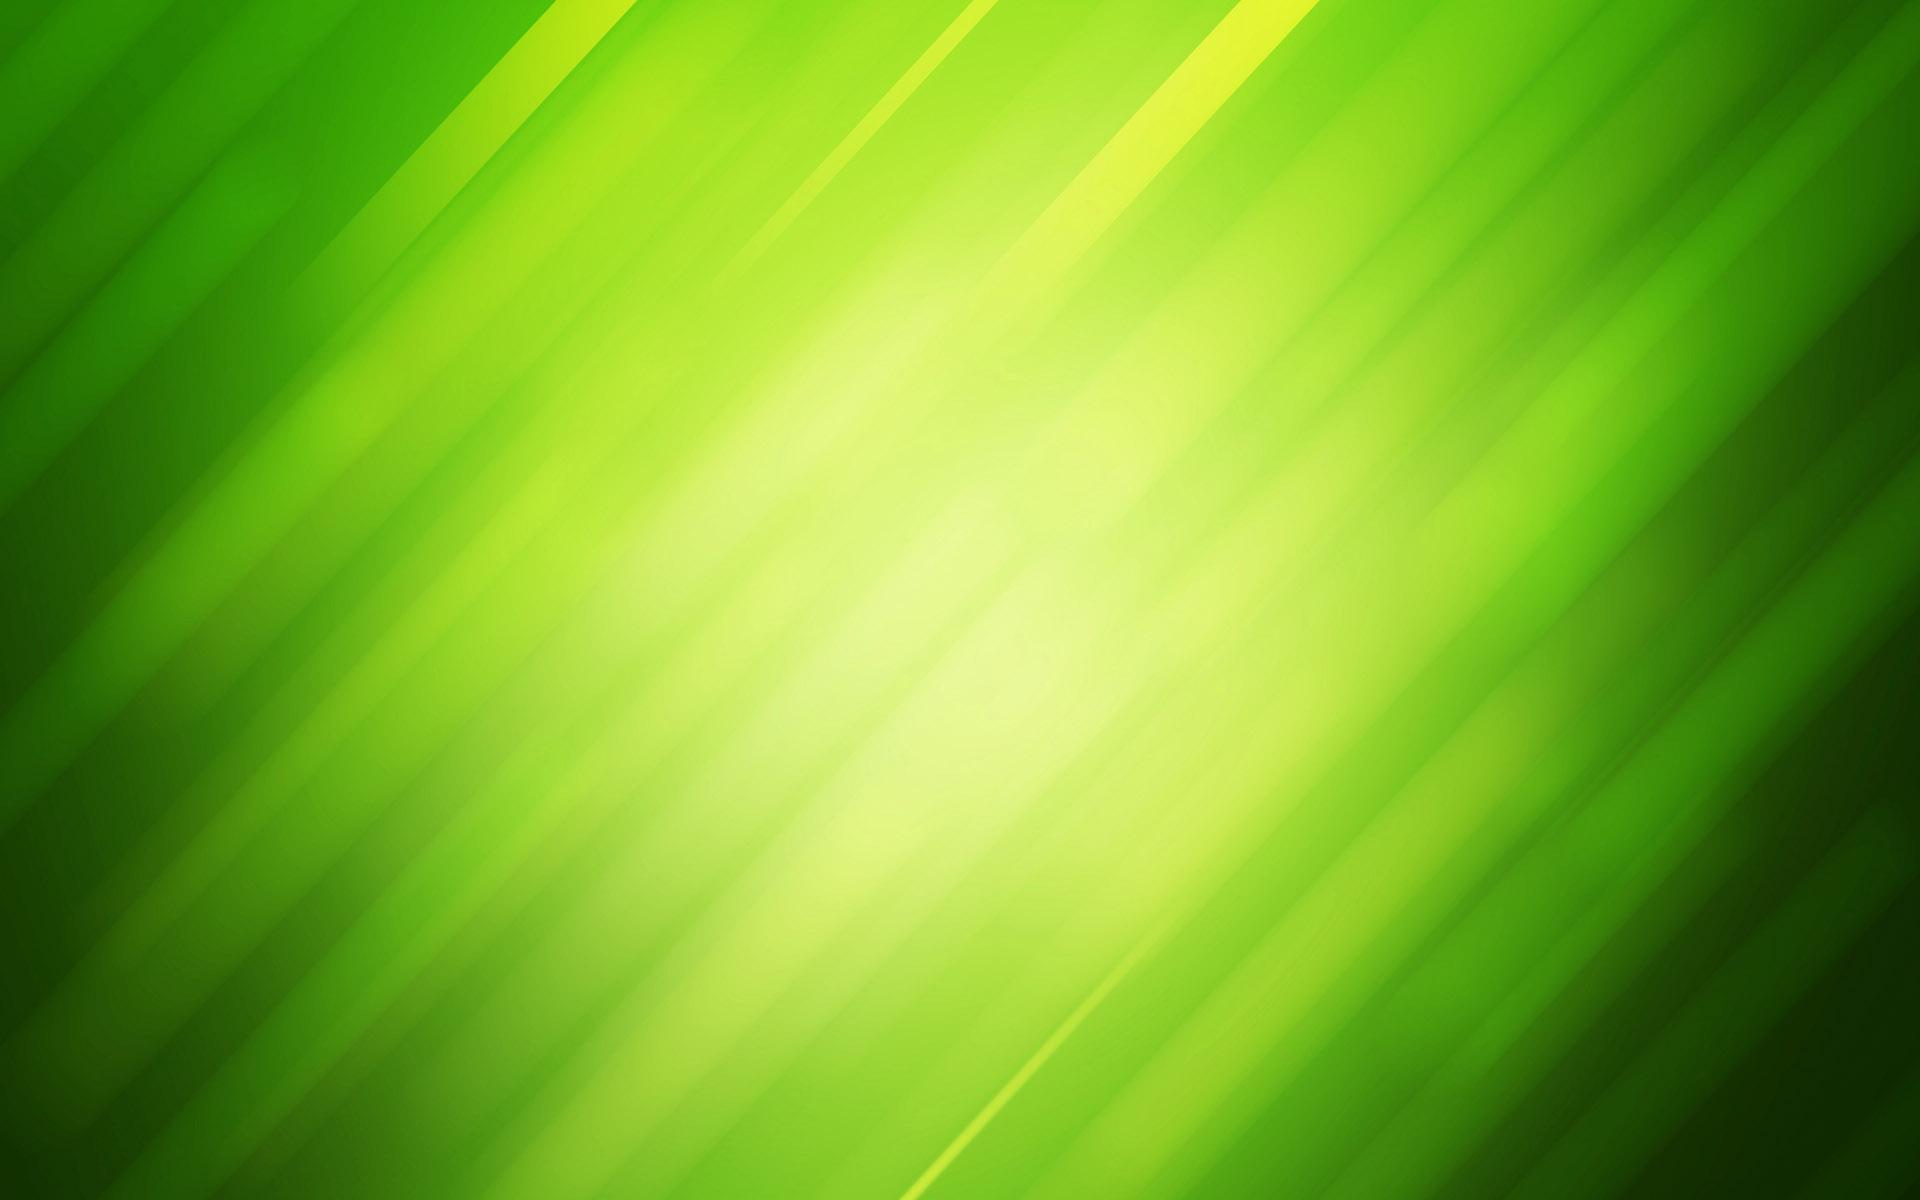 Green-Wallpaper-Pics-Free.jpg